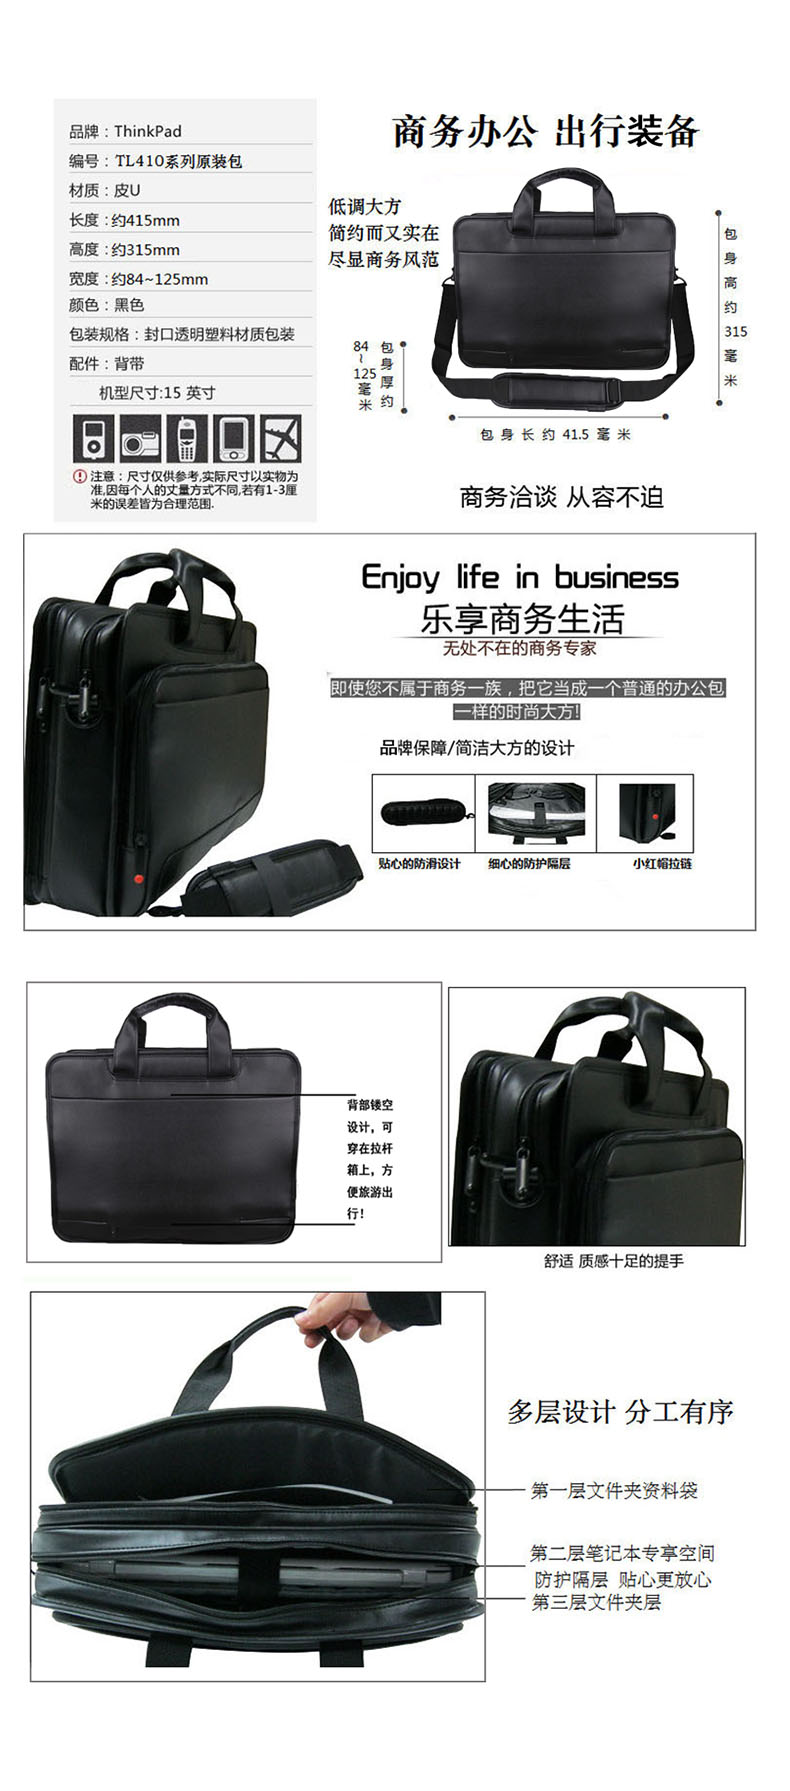 "Original Lenovo ThinkPad TL410 Laptop Bag 15.6/""usiness Briefcase Shoulder Sags"